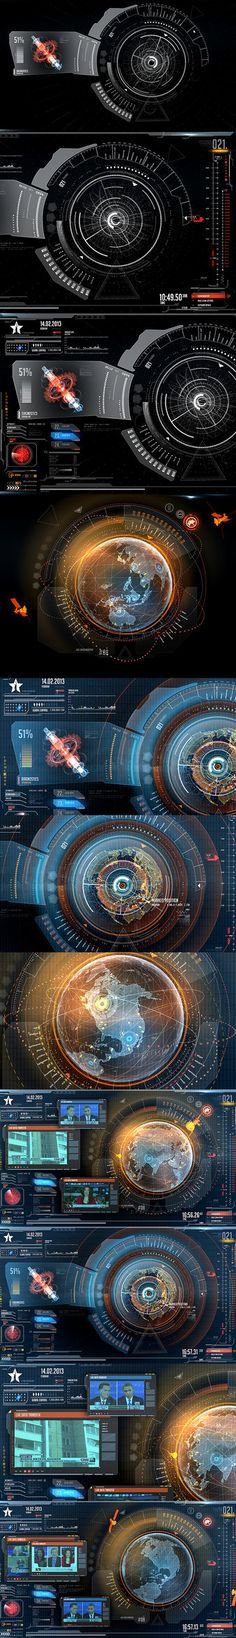 2RISE - FUTURE INTERFACE by Jedi88